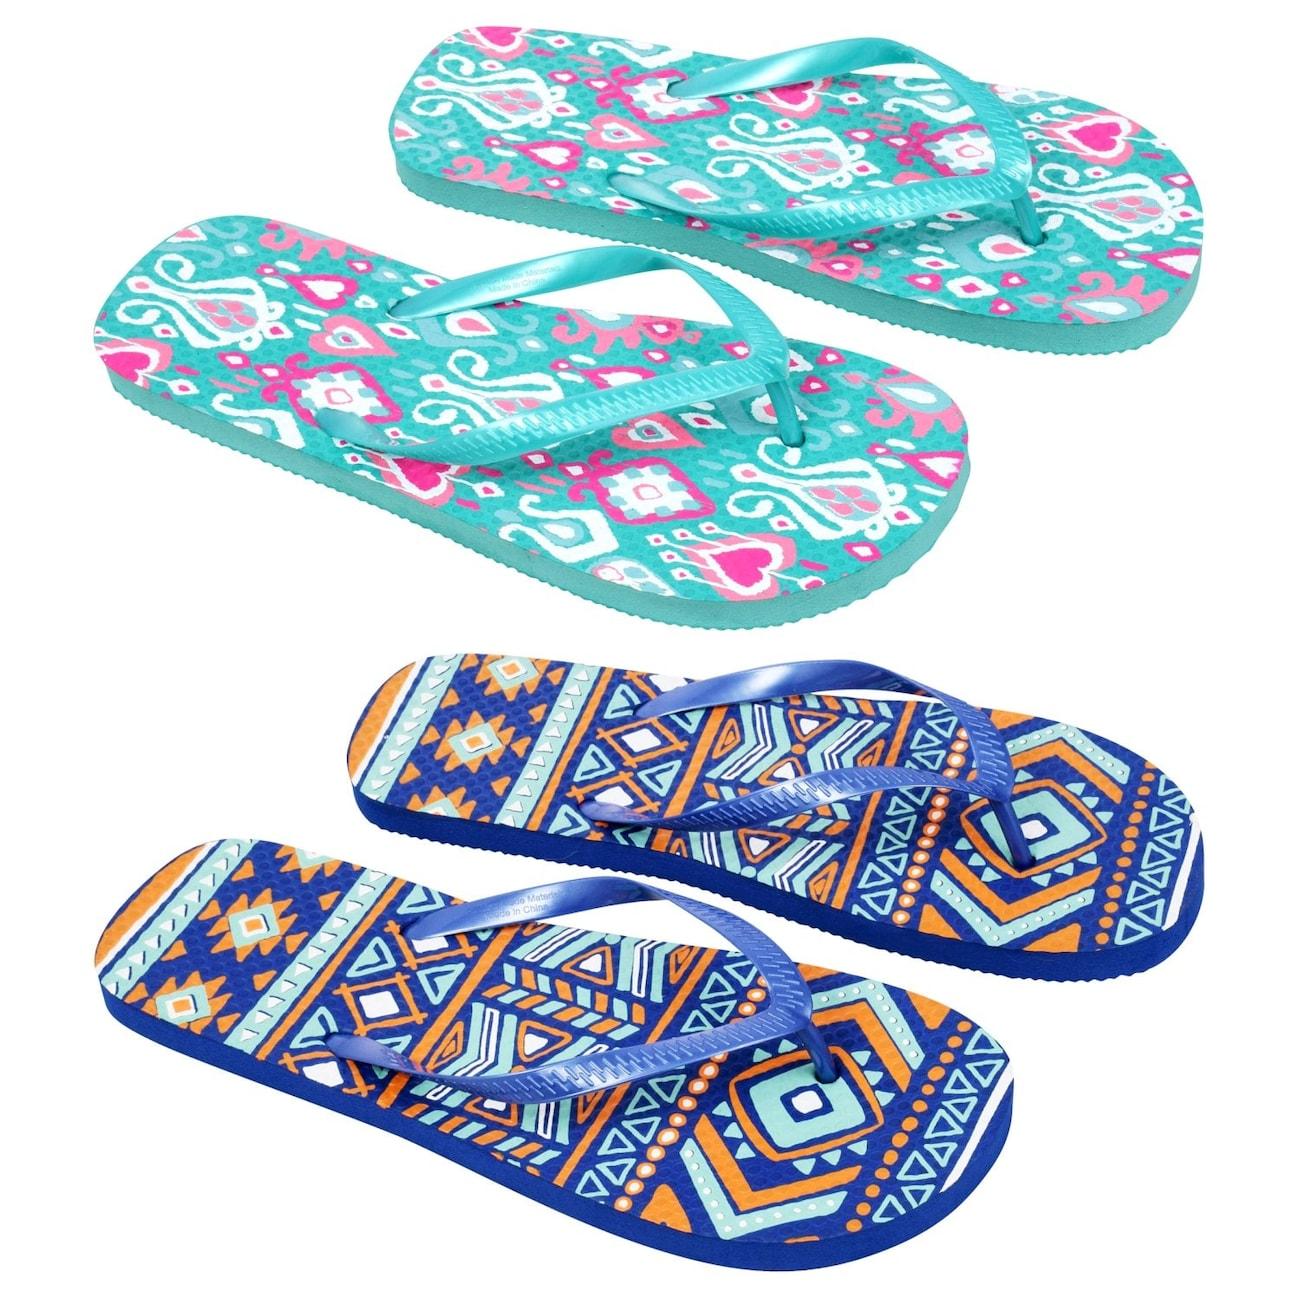 c2a08a9b79afa Ladies  Tribal Print Rubber Flip-Flops